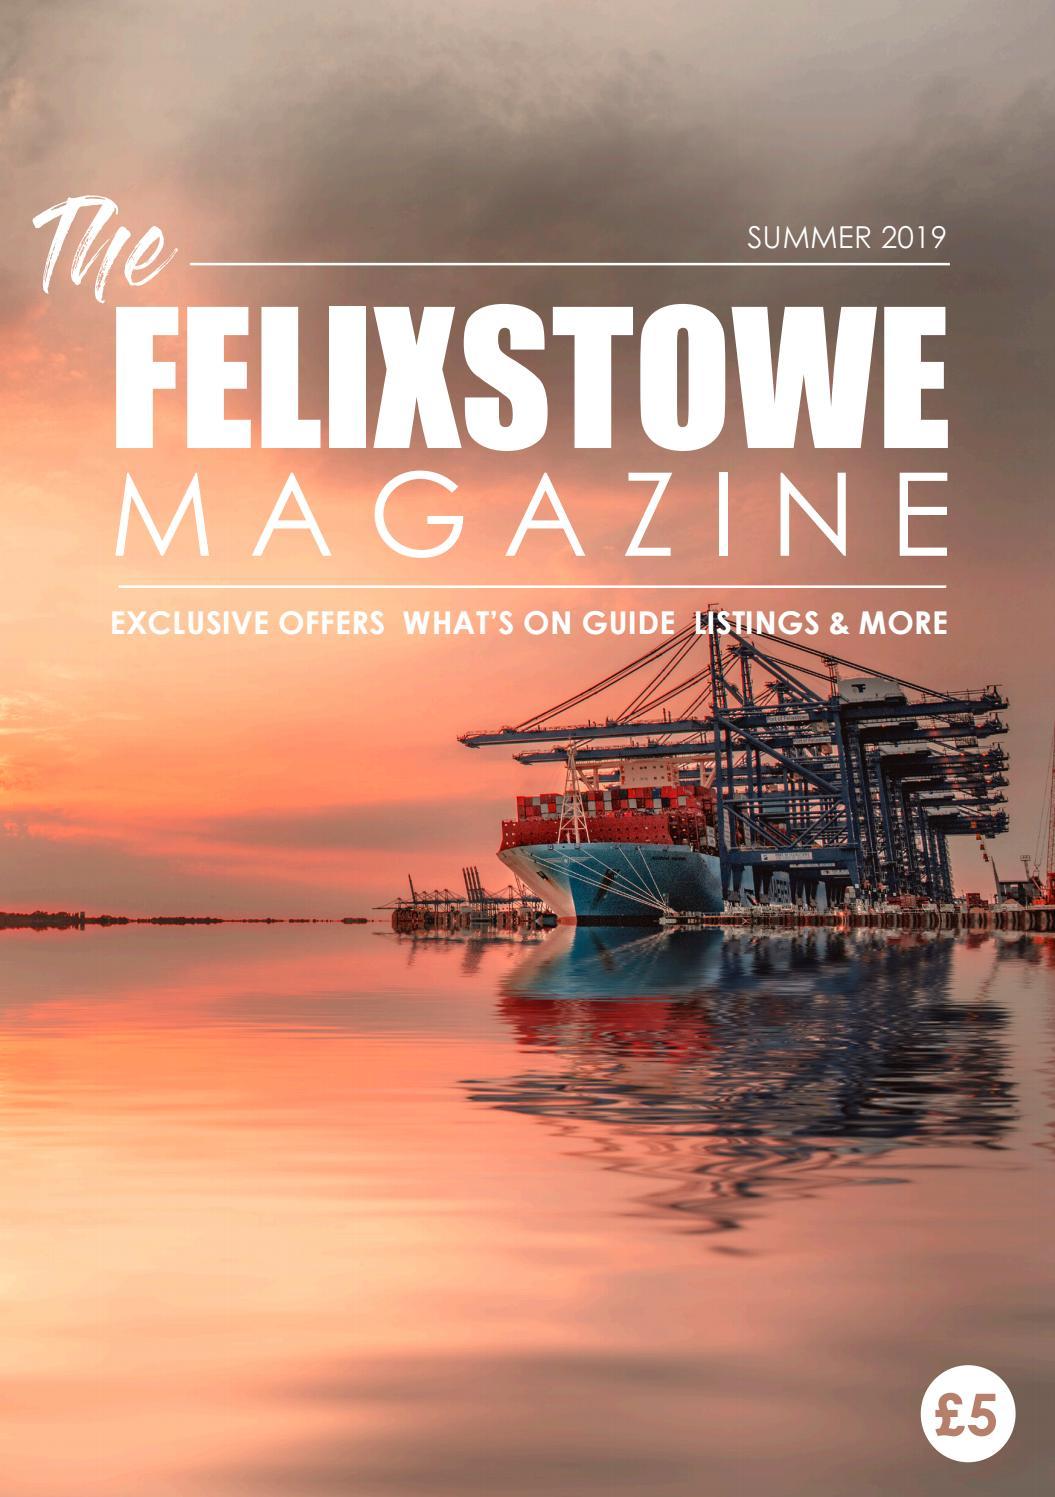 The Felixstowe Magazine Summer 2019 By Birdy Publications